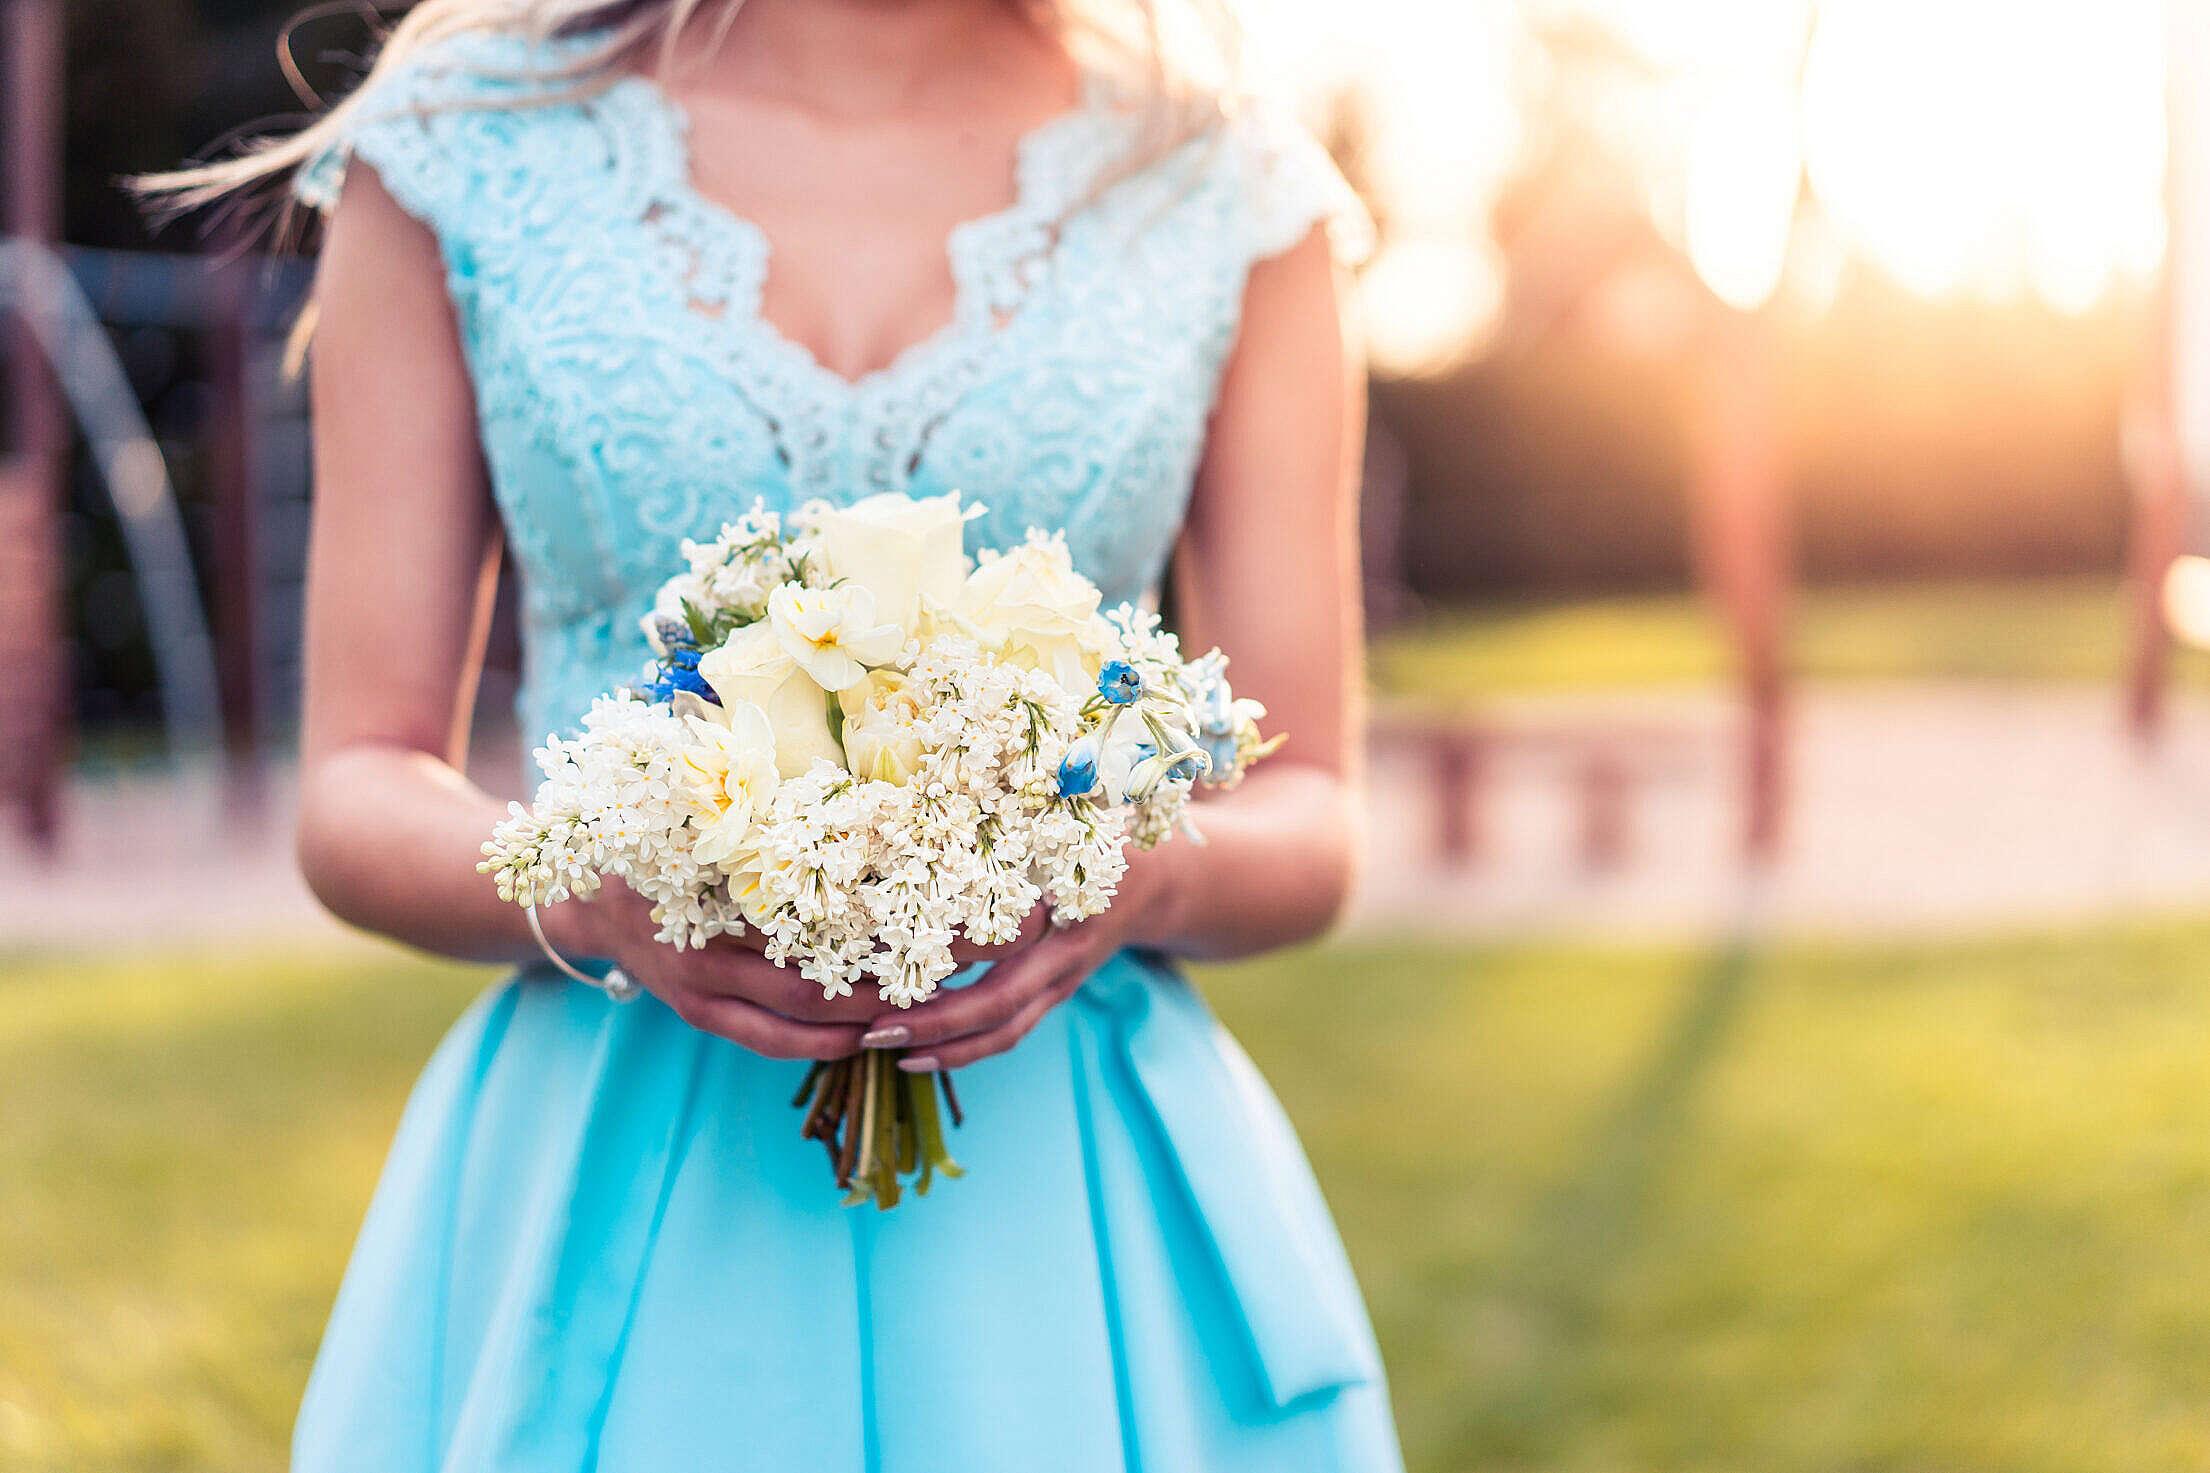 Beautiful Bridesmaid in Blue Dress Free Stock Photo